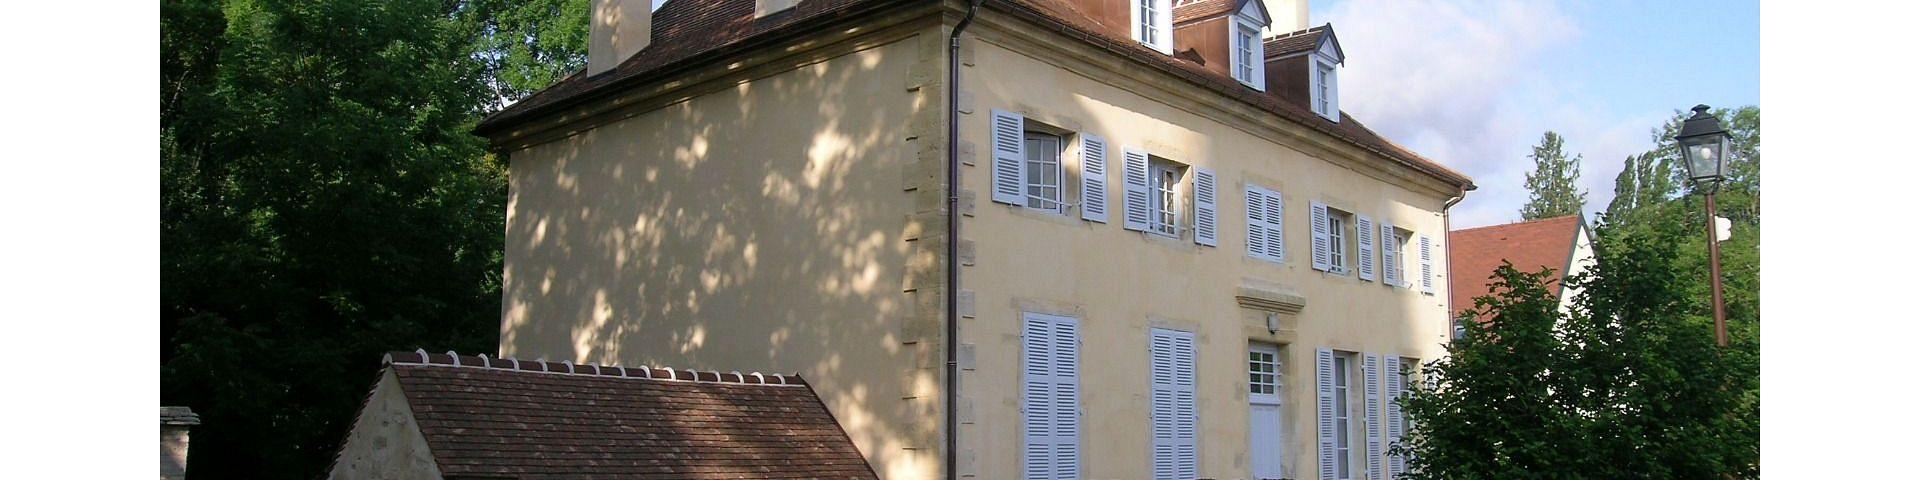 Gilly-les-Citeaux - Presbytere (21)